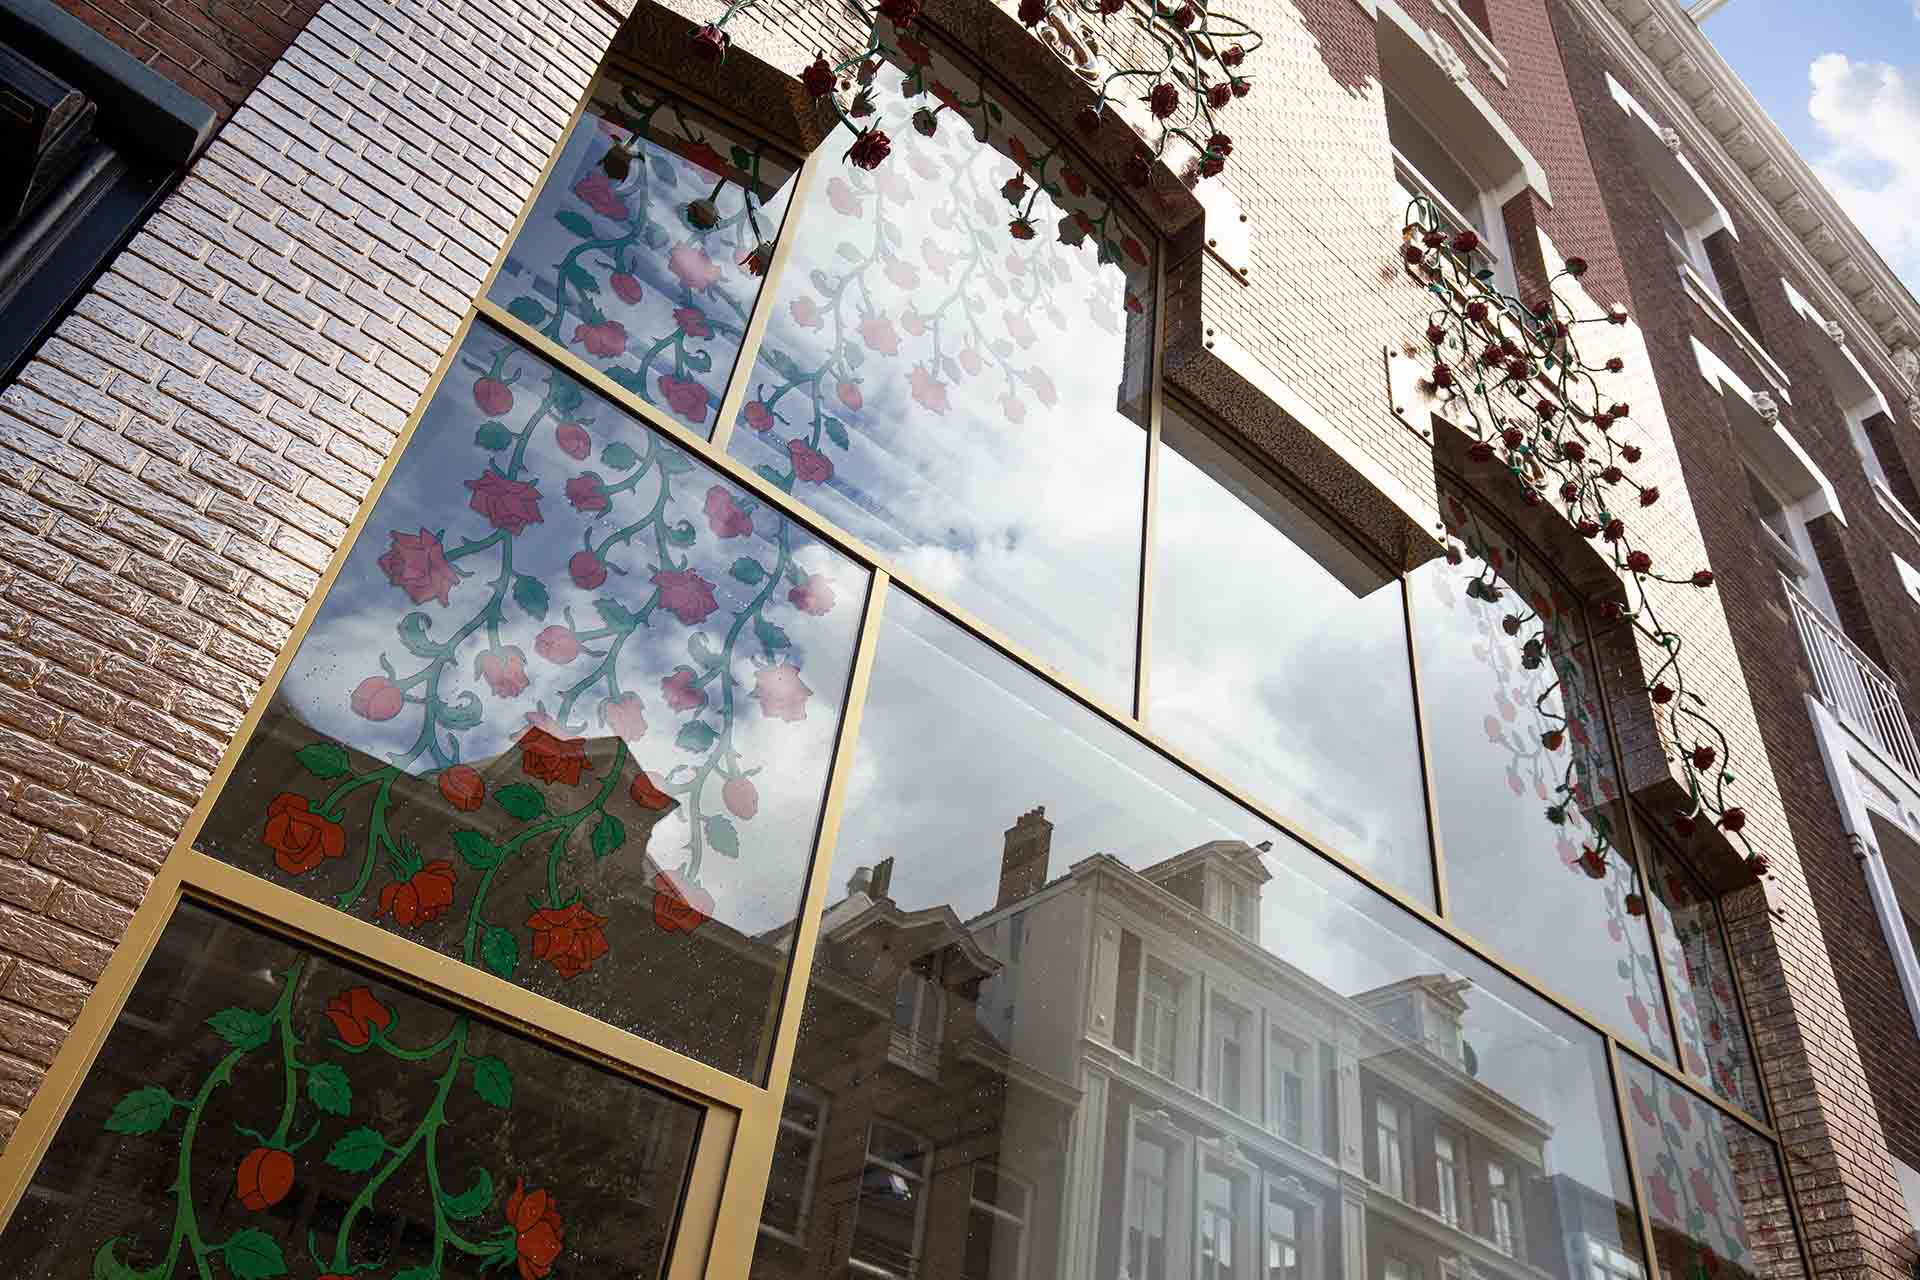 MHB-SL30-ISO-2020-PV-P.C.-Hooftstraat-45-Amsterdam-1-14